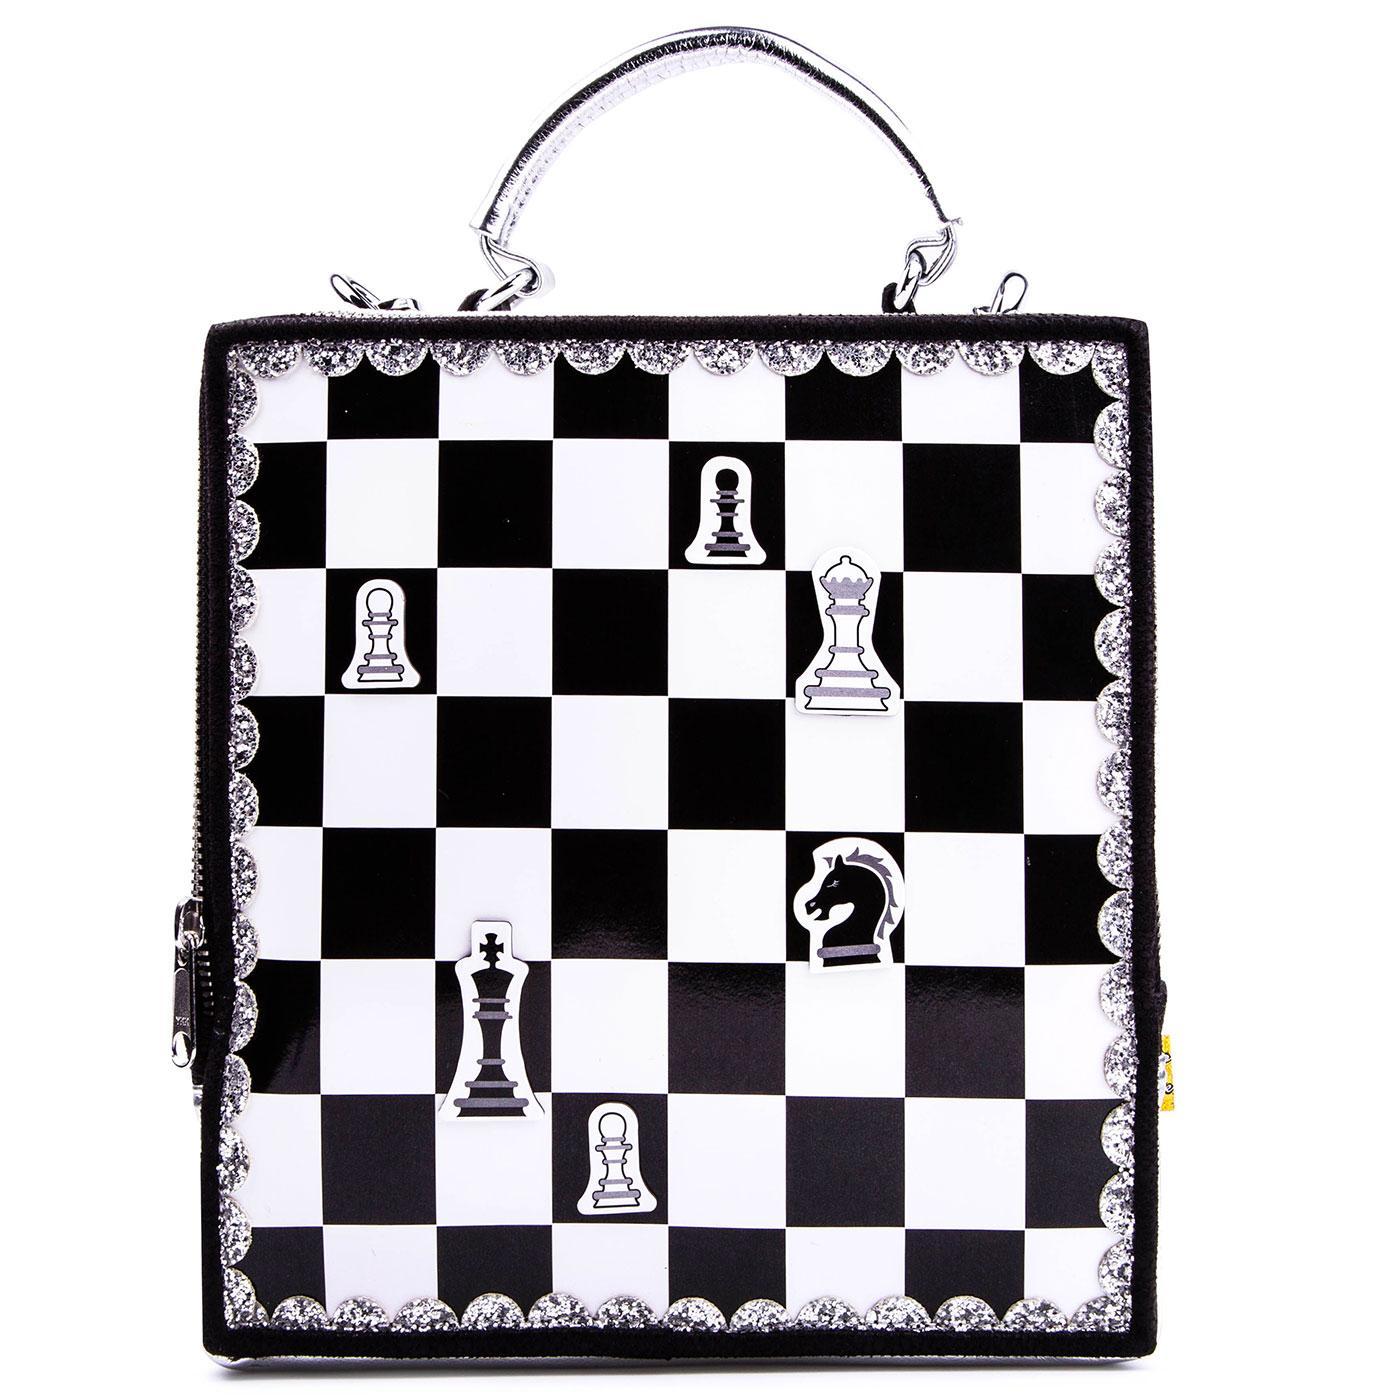 Your Move IRREGULAR CHOICE Chess Board Bag